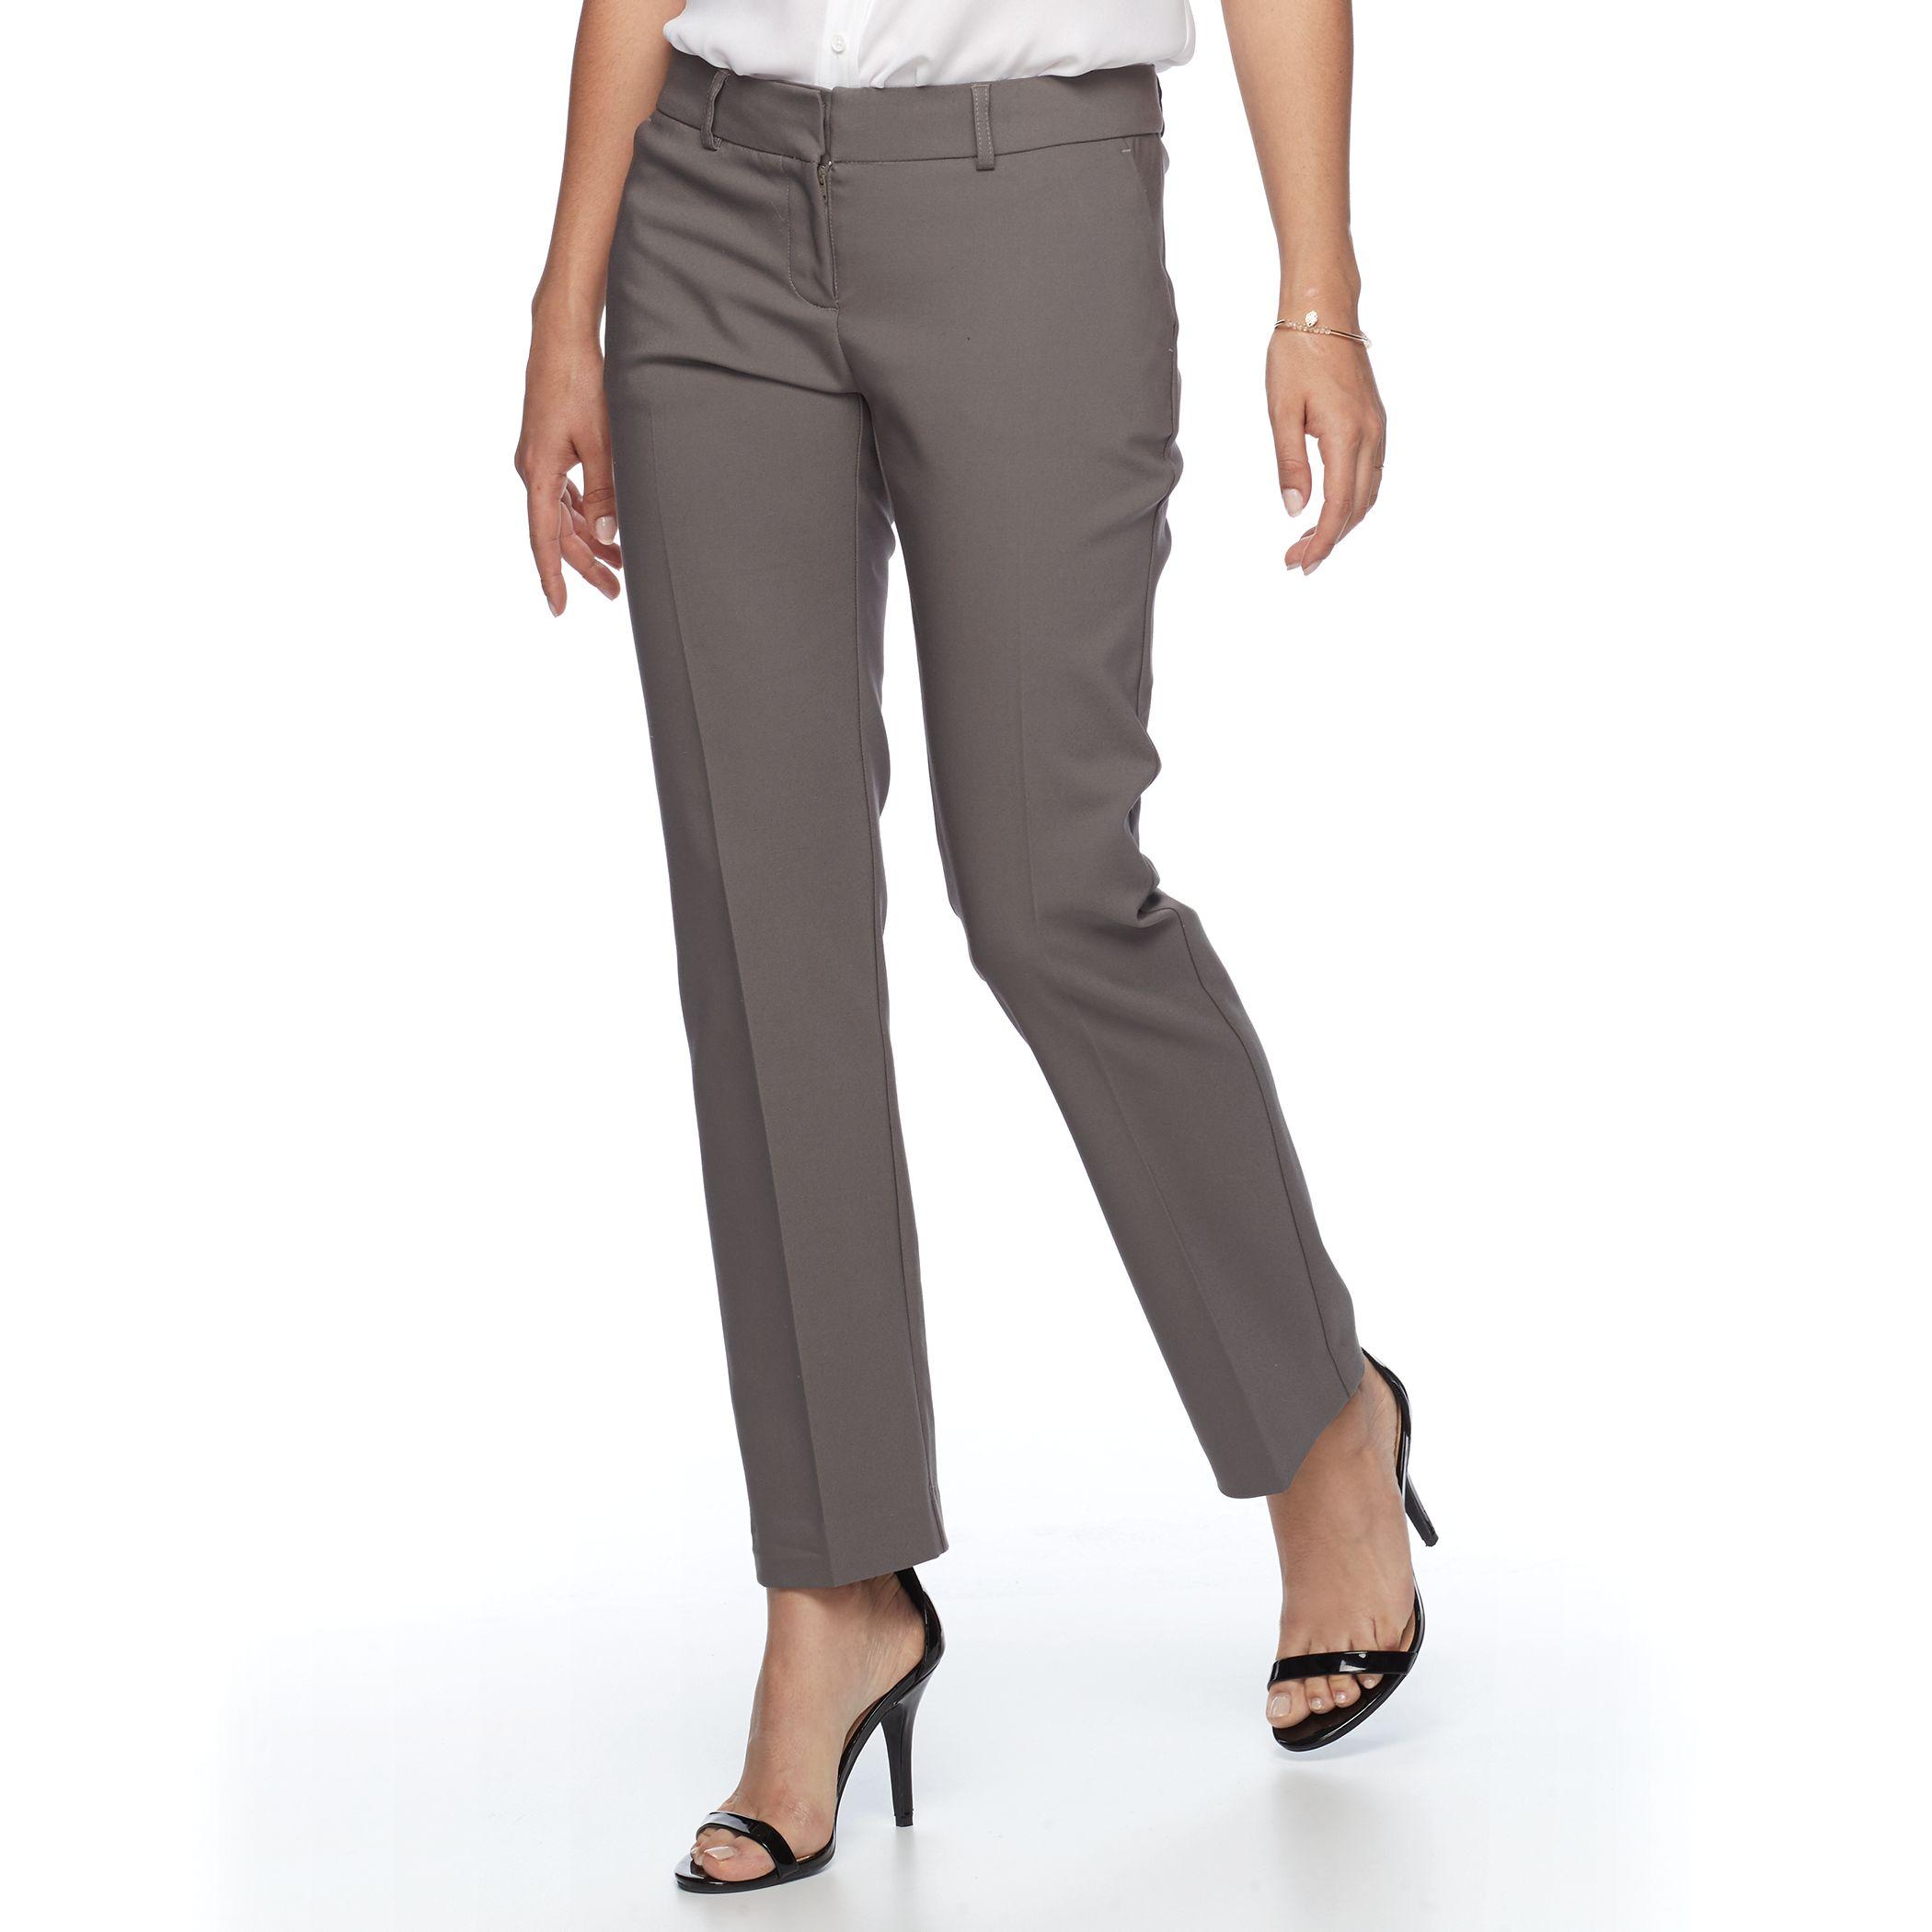 Straight Leg Dress Pants hxpJgvaX